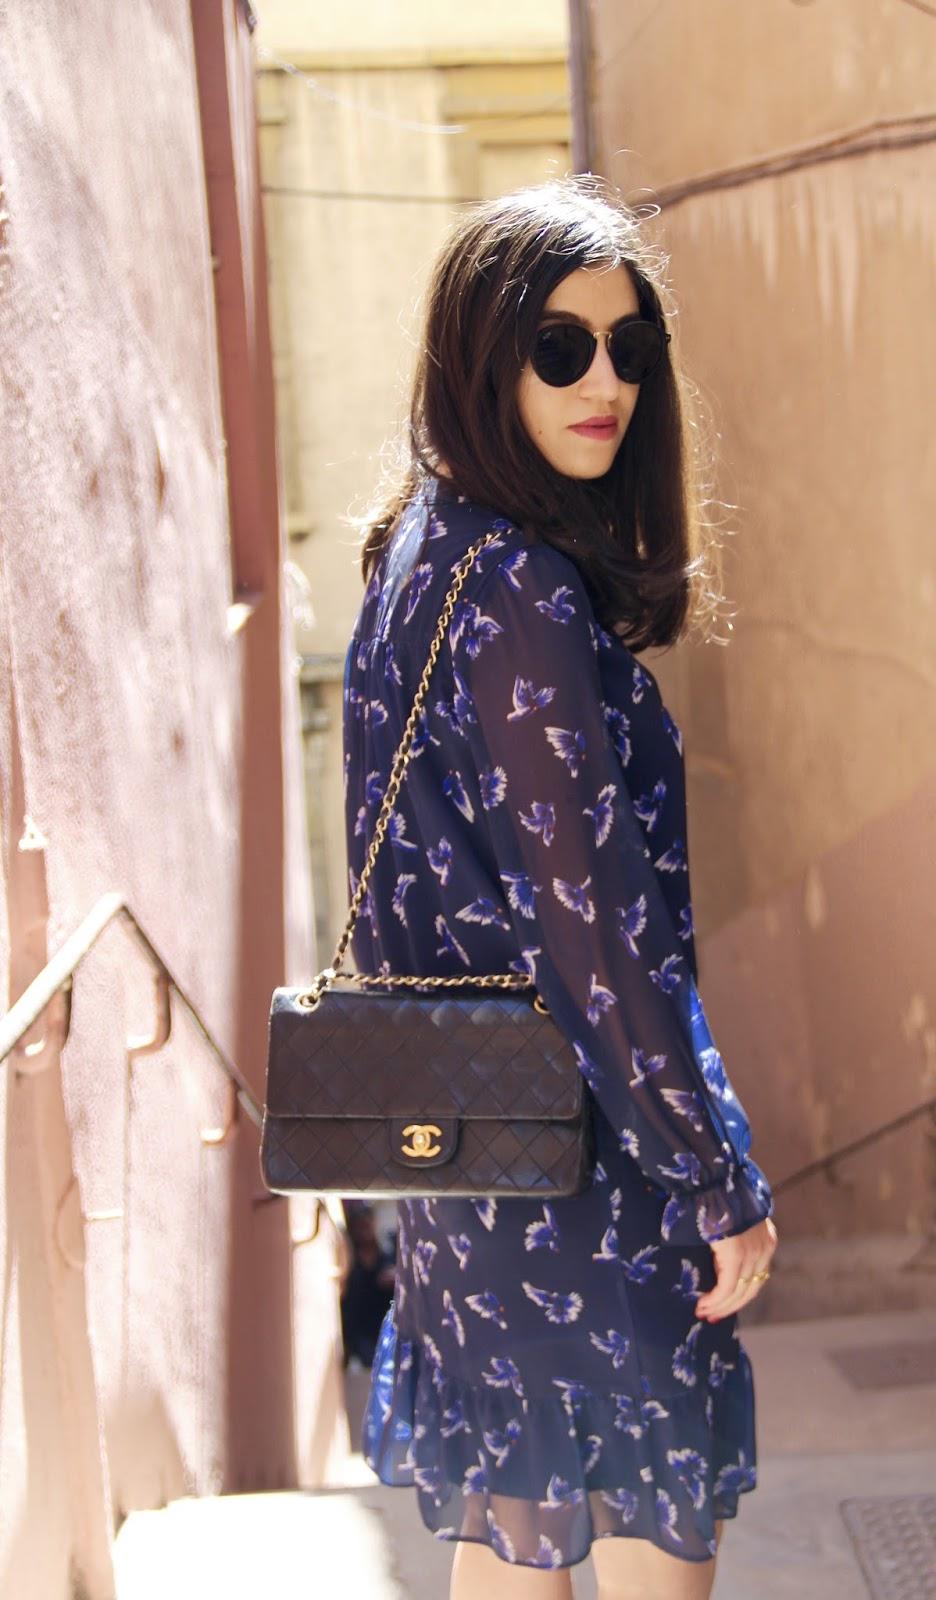 modeuse, blogueuse lyonnaise, blogueuse parisienne